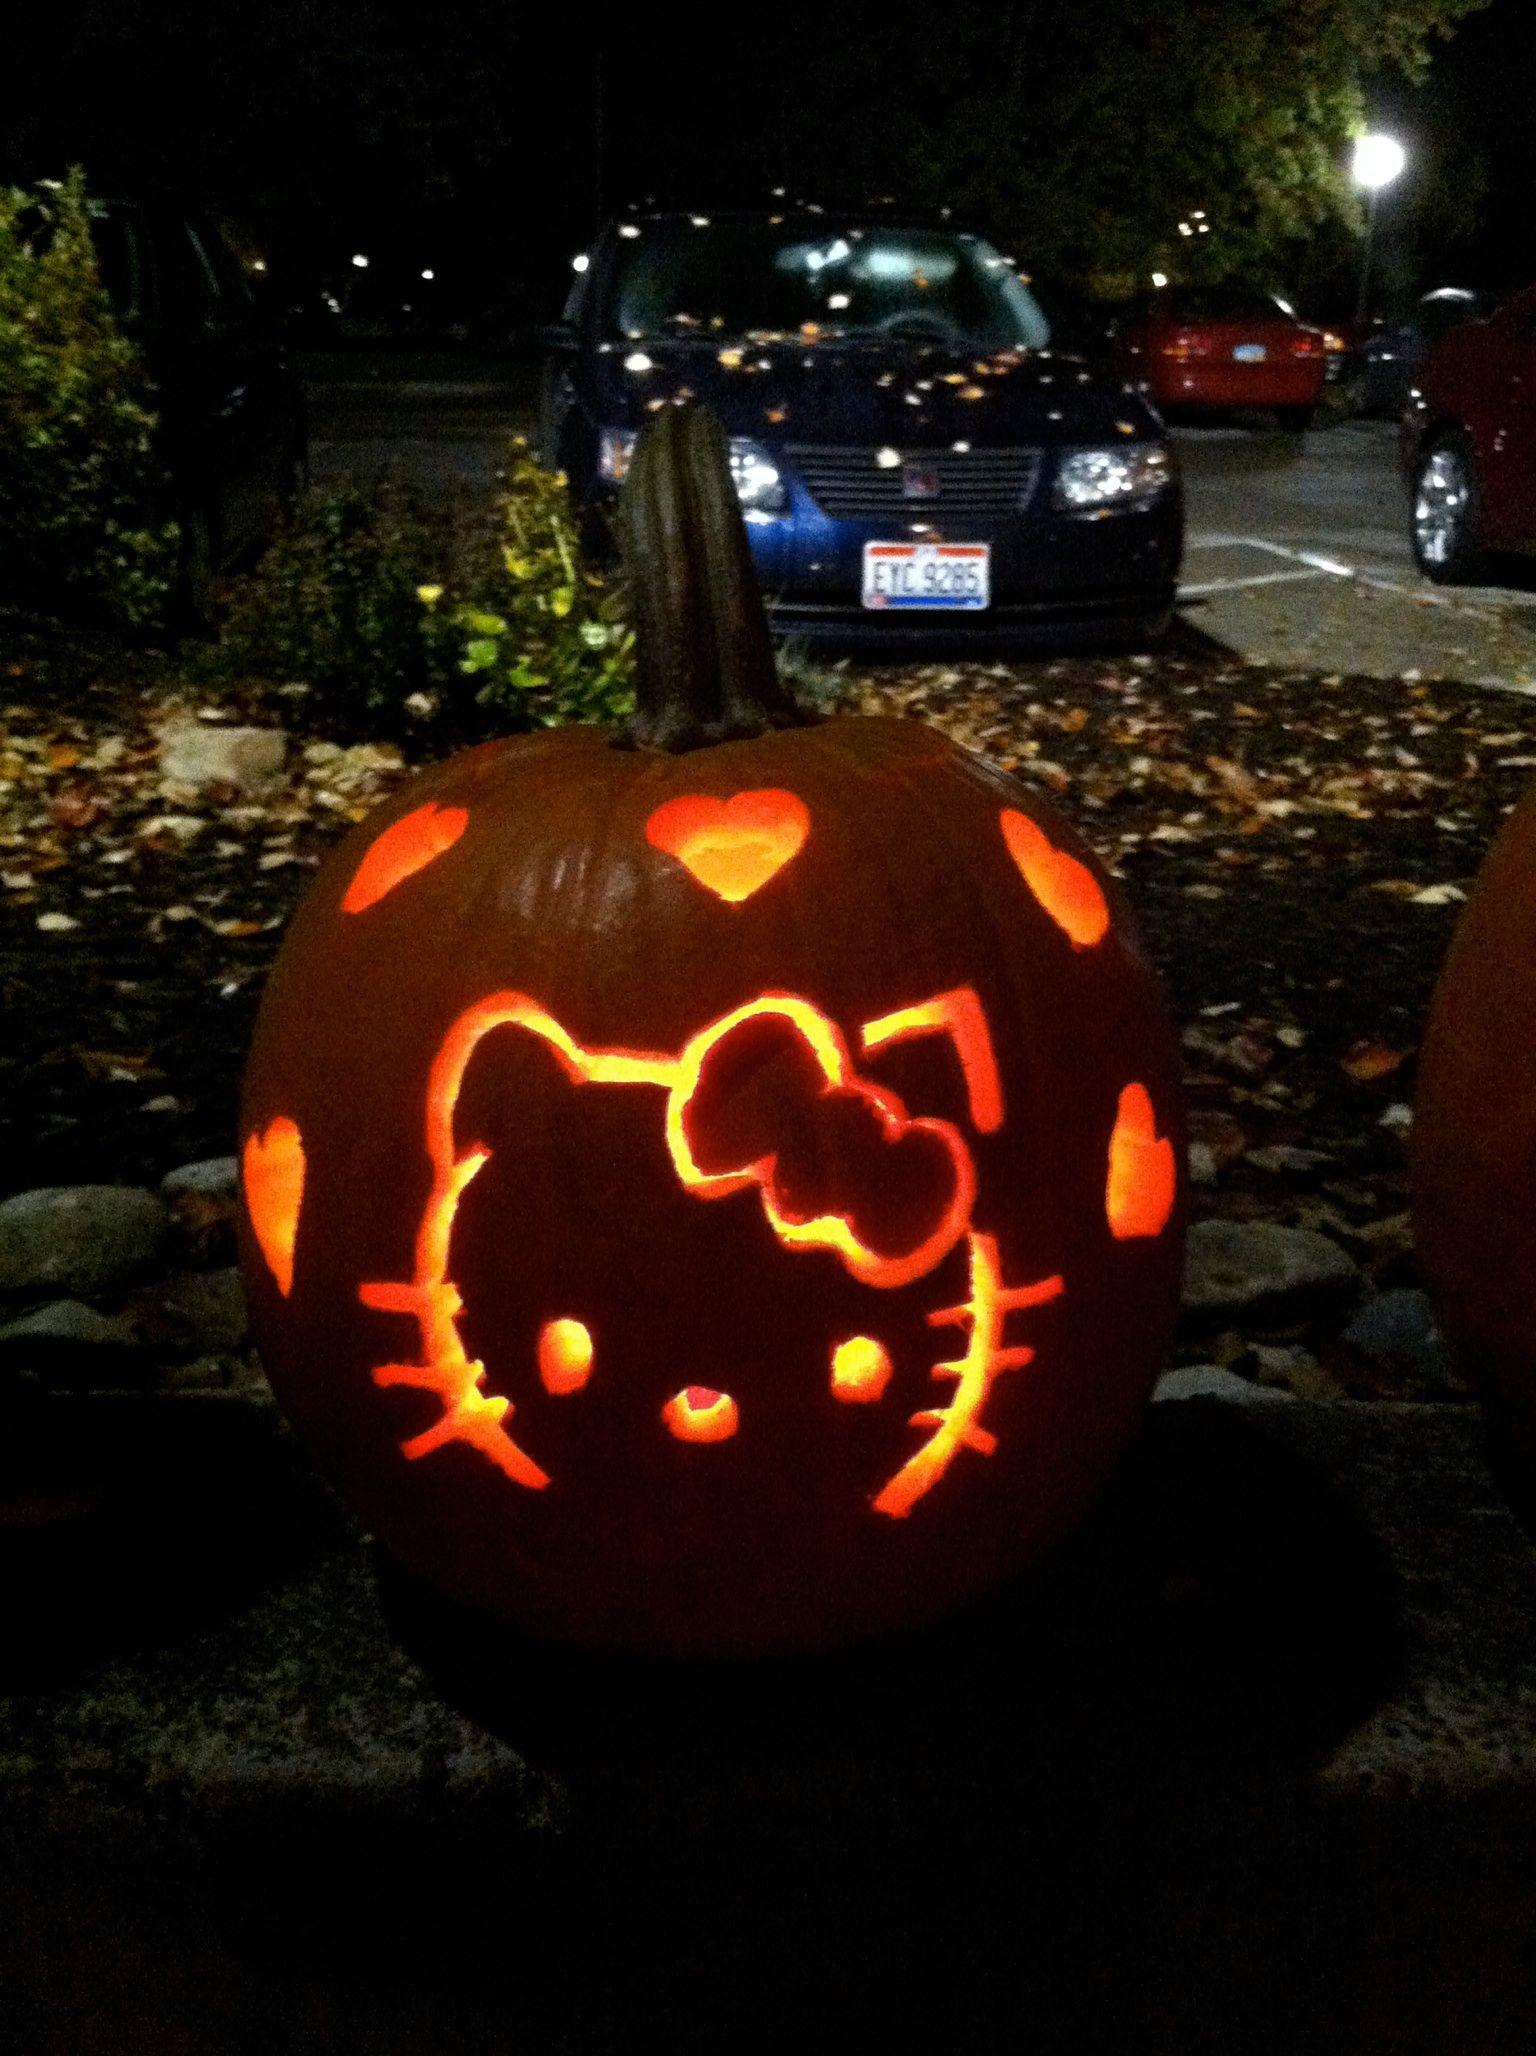 My hello kitty pumpkin | Holiday | Pinterest | To be, Hello kitty ...